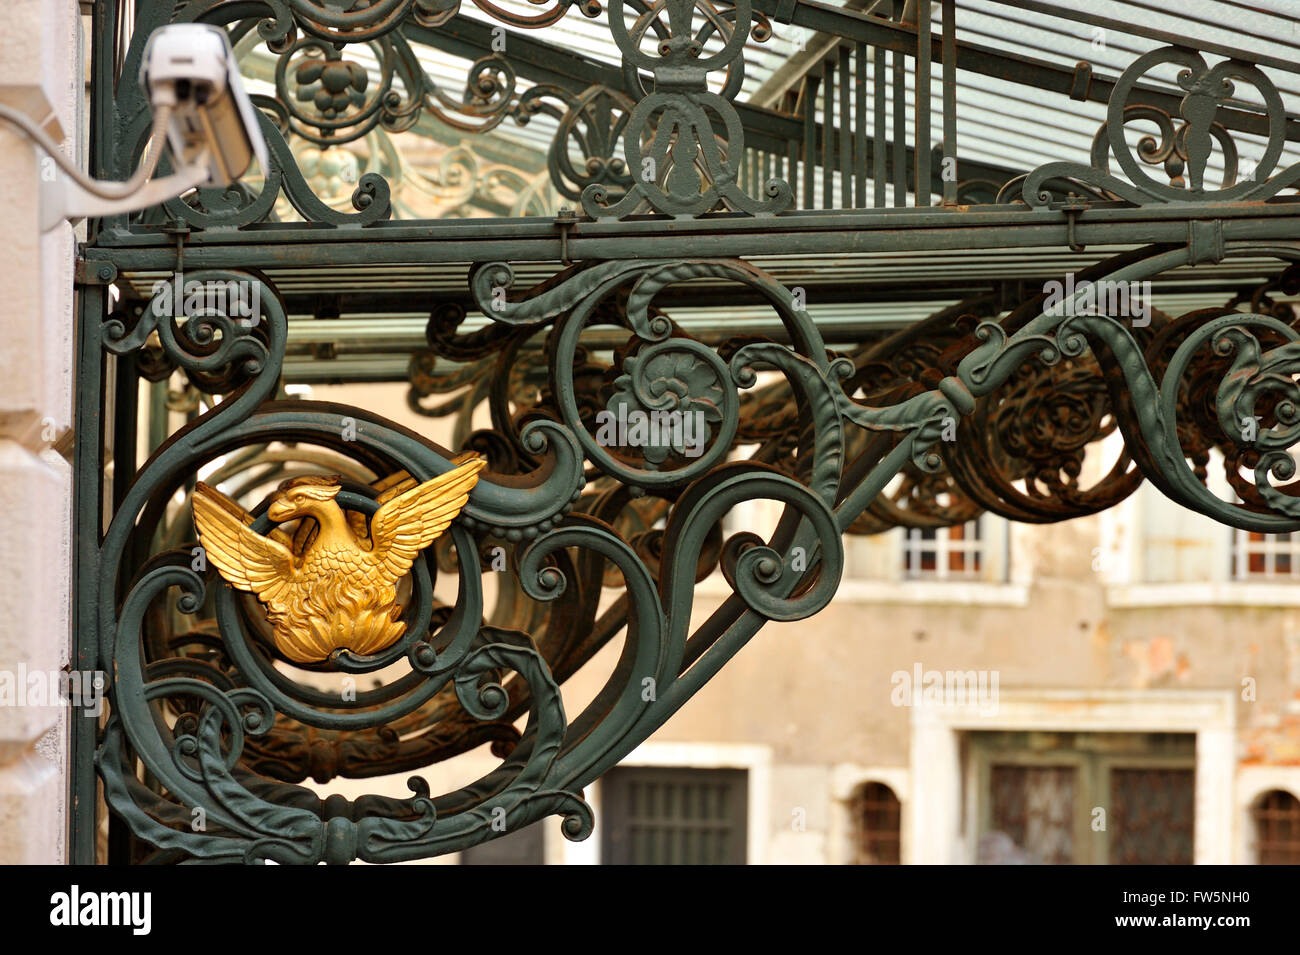 Phoenix, La Fenice. Golden phoenix on ornate cast iron work of the new opera house La Fenice in Venice, reopened - Stock Image